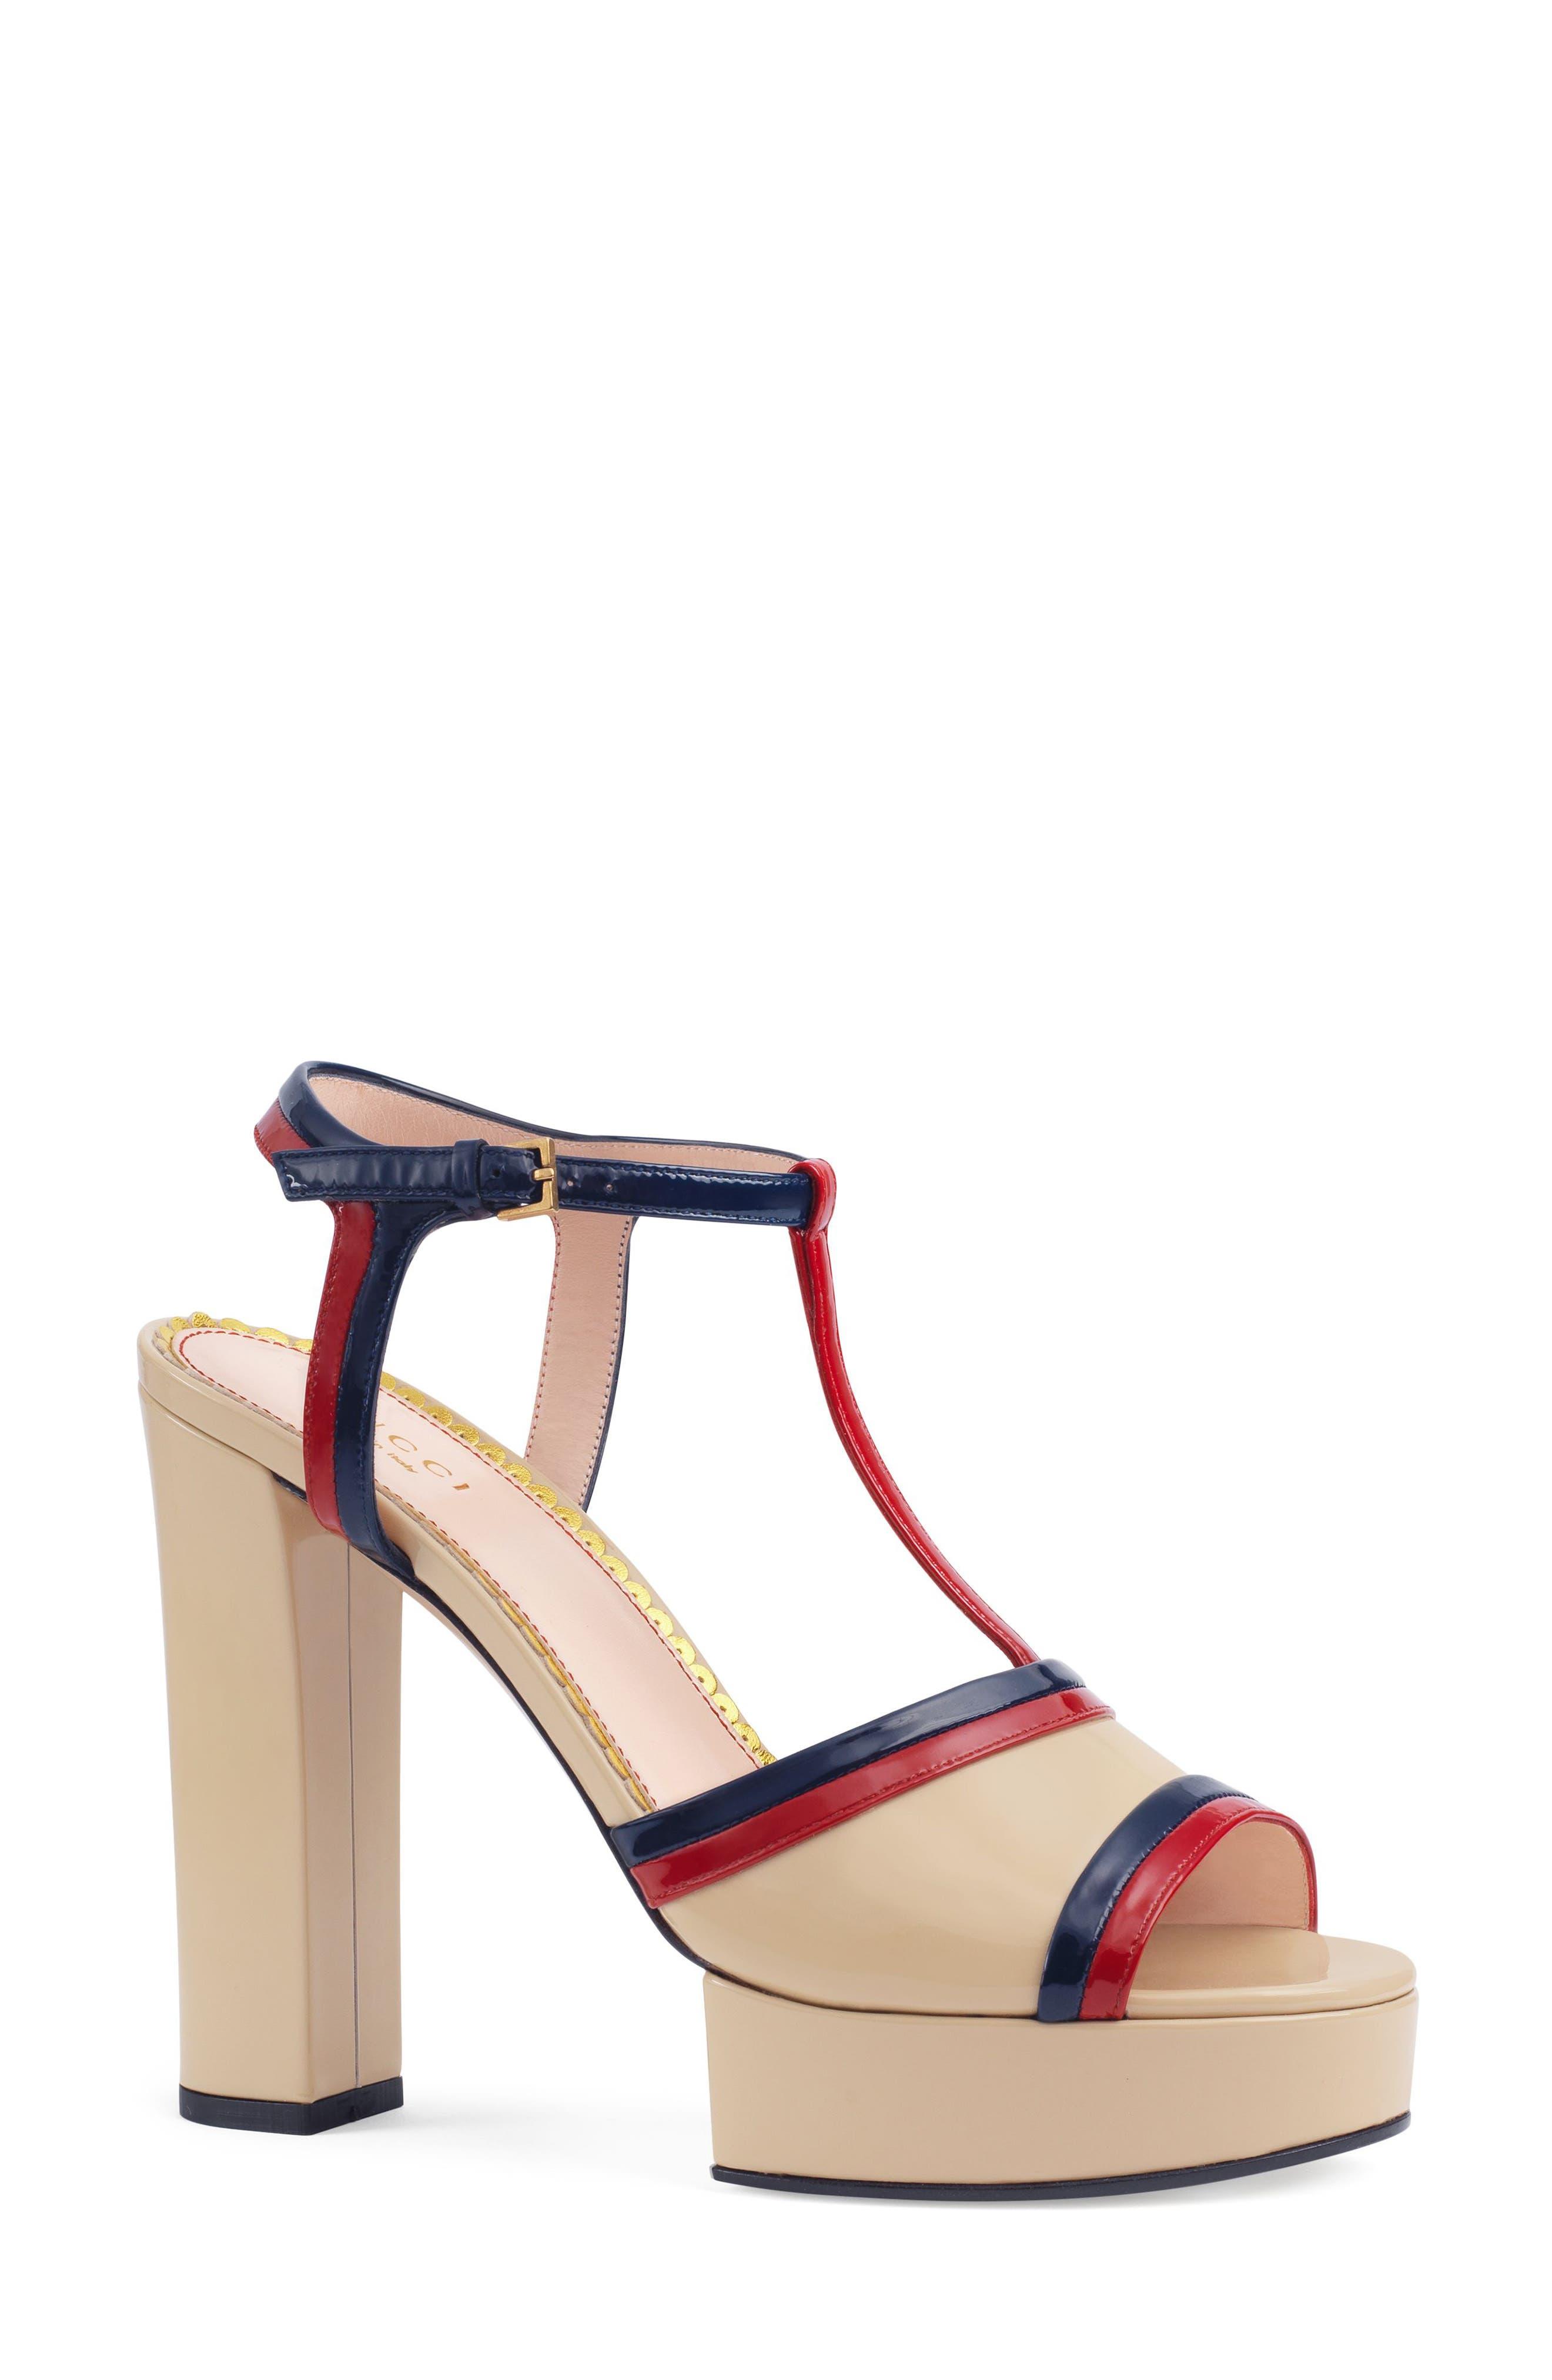 Millie T-Strap Platform Sandal,                             Main thumbnail 1, color,                             BEIGE/ RED/ BLUE